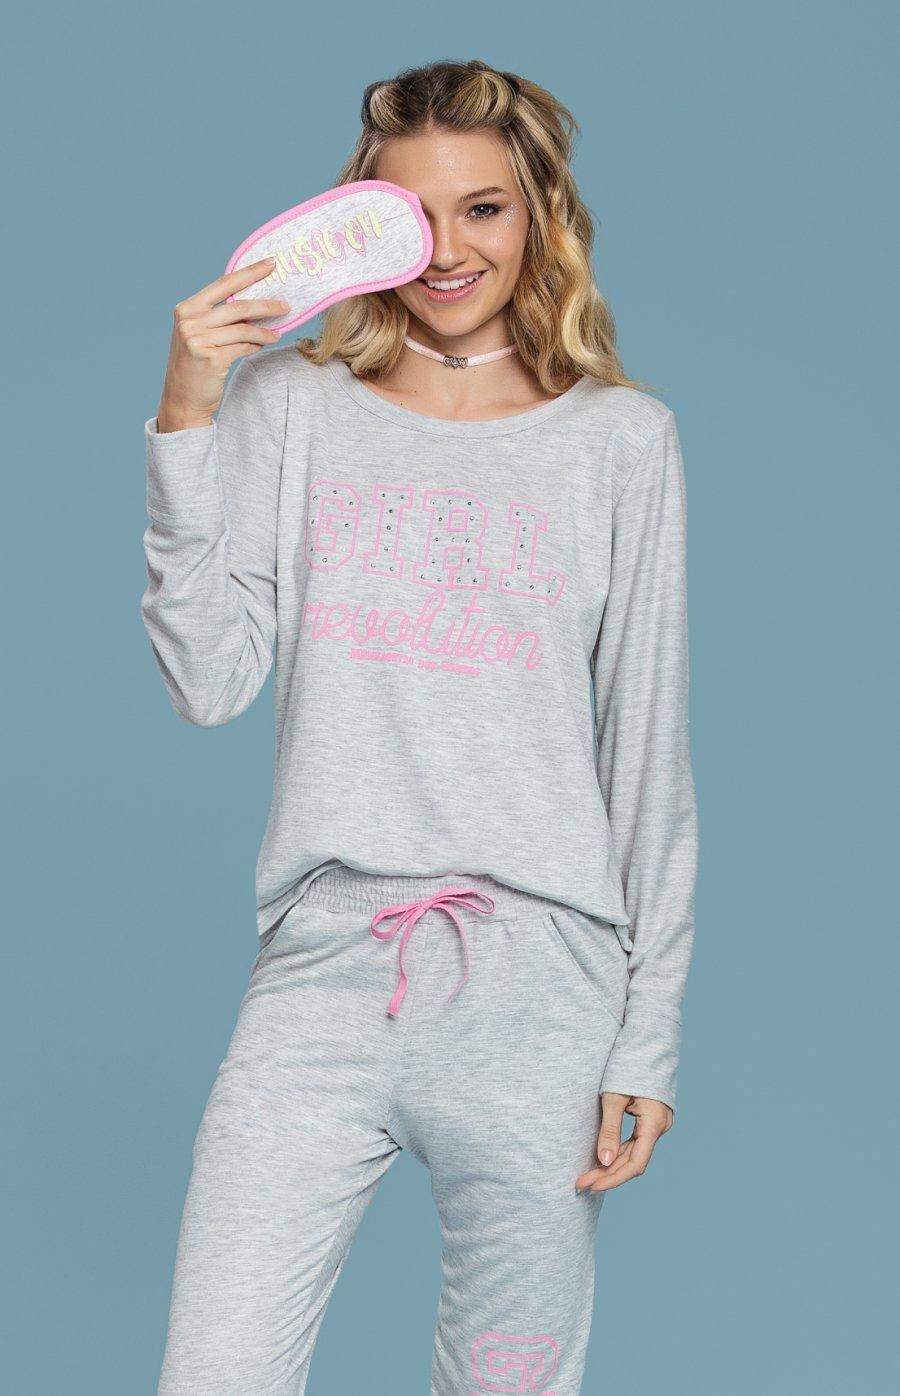 Pijama Girls PROMO Inverno 2018